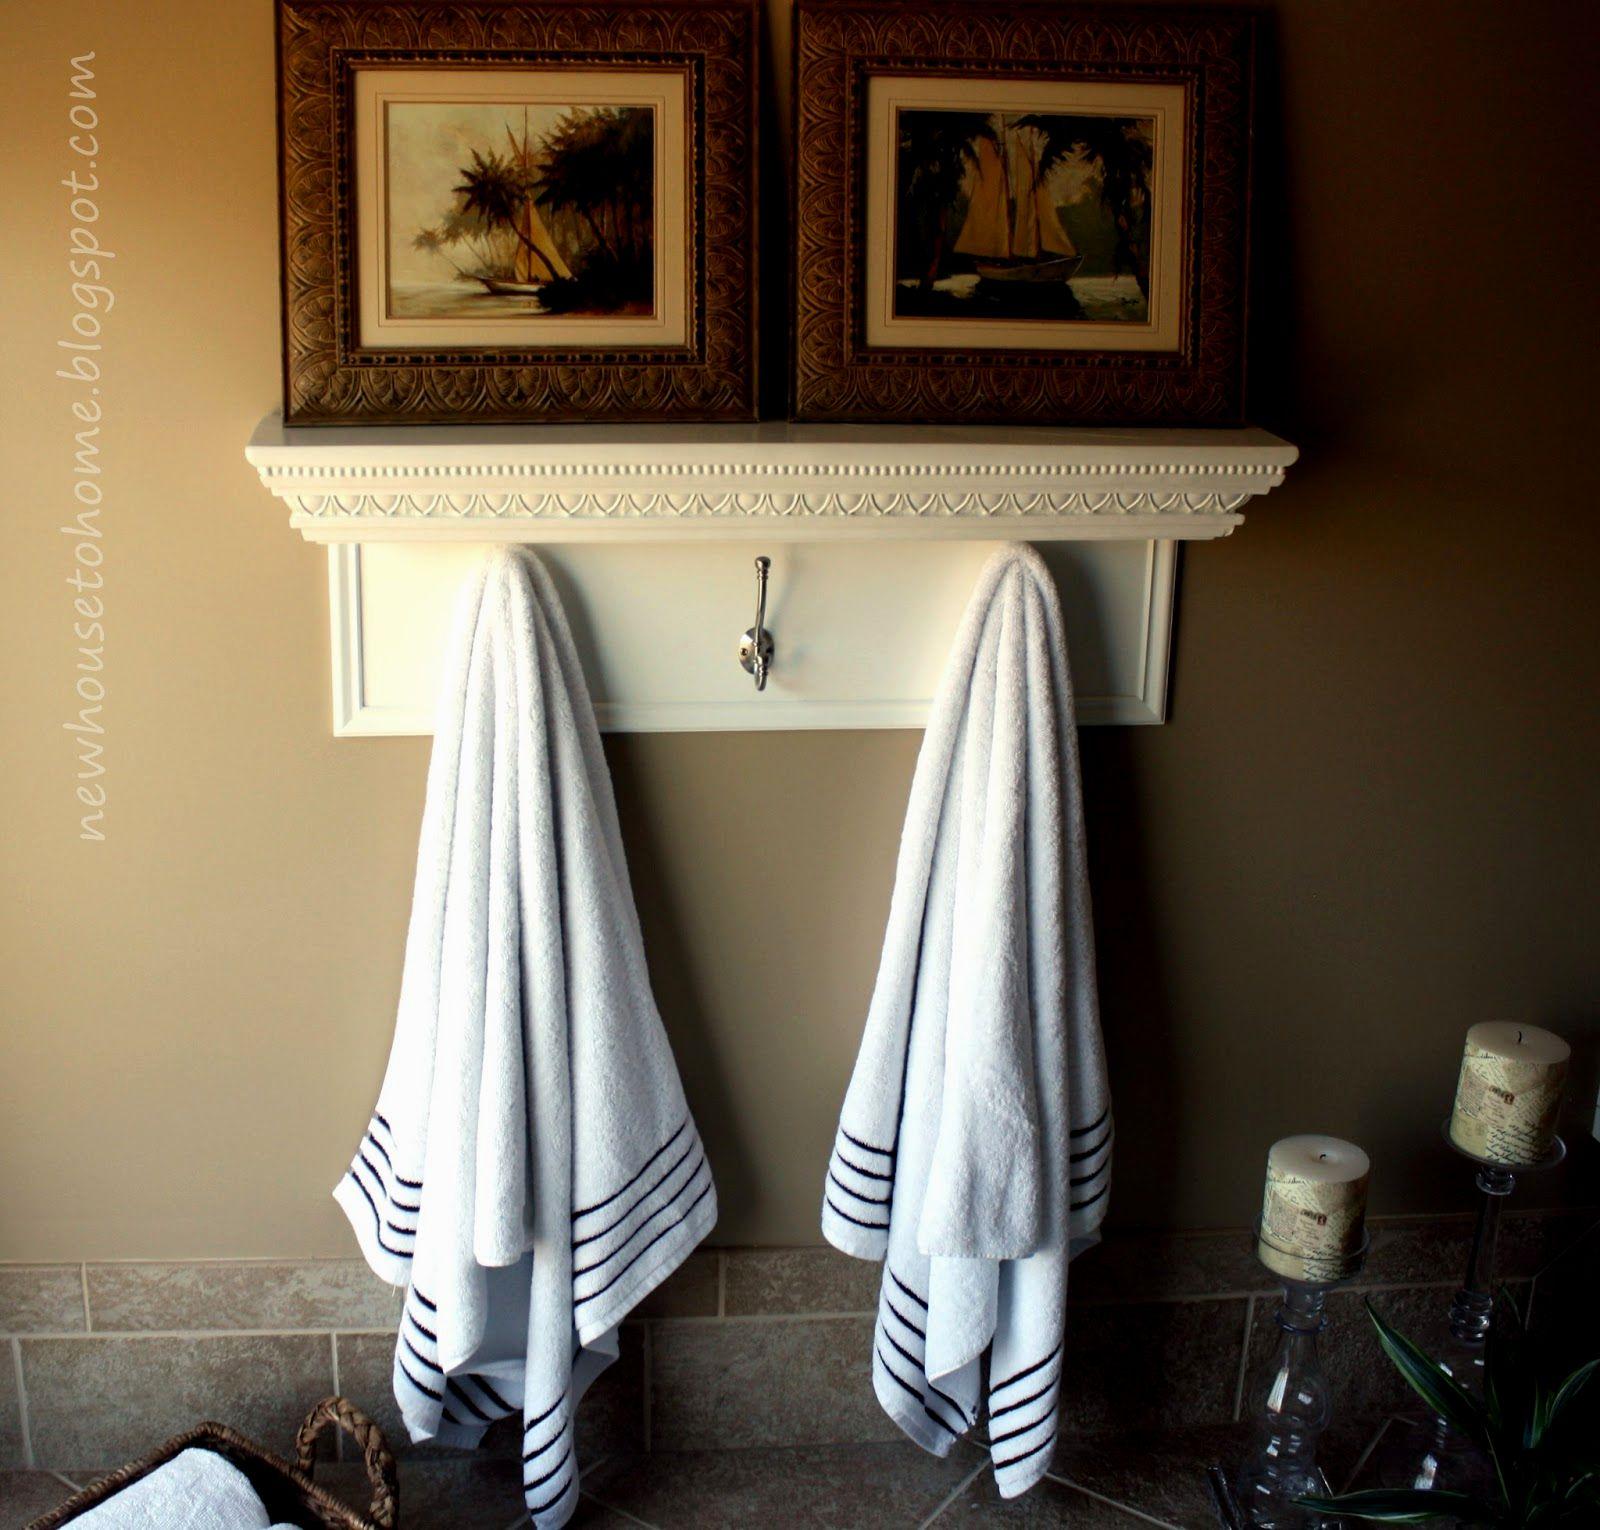 excellent bathroom stall hardware inspiration-New Bathroom Stall Hardware Online